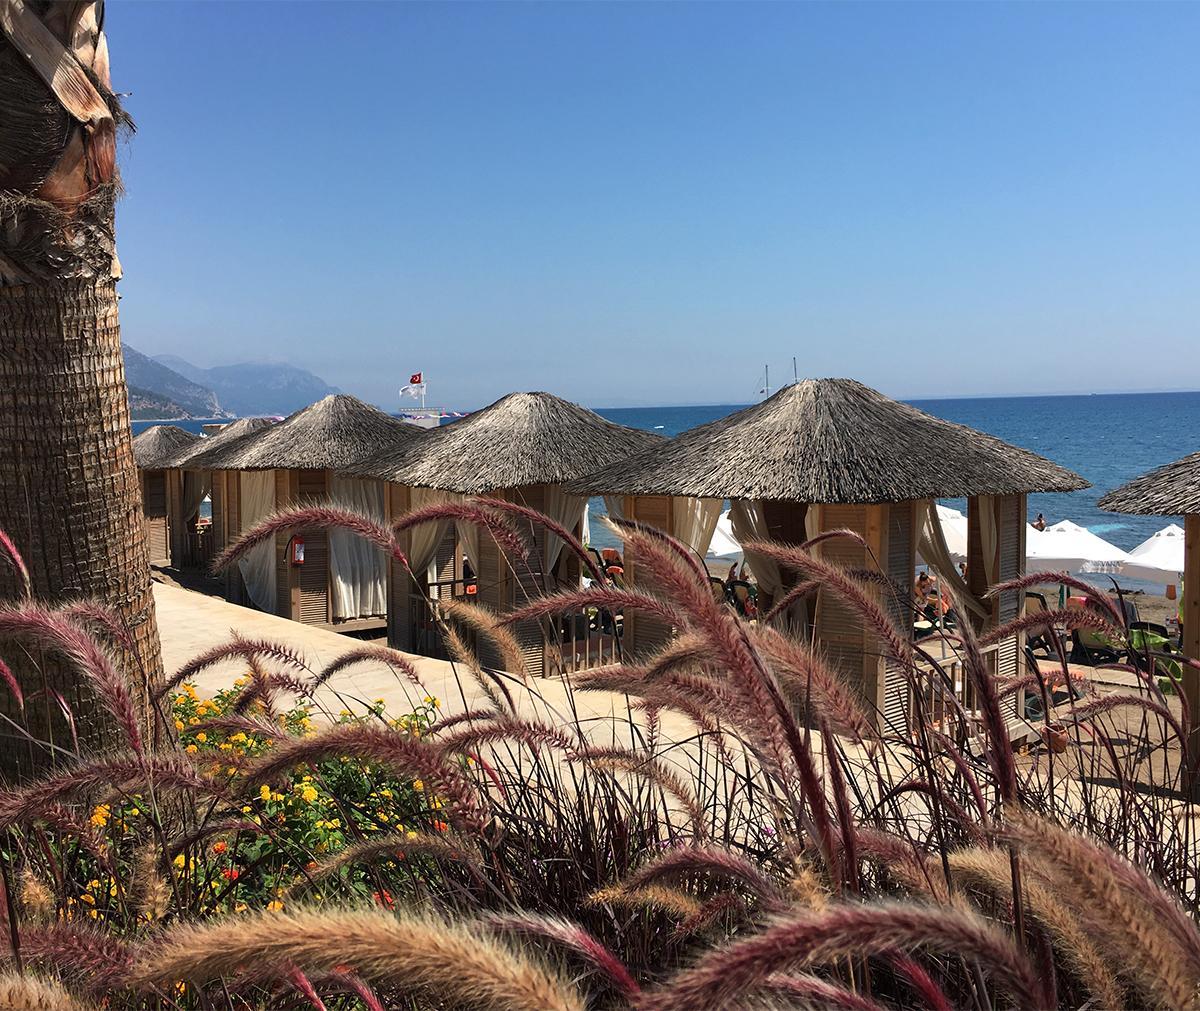 nirvana-lagoon-villas-suites-and-spa-morodan-3